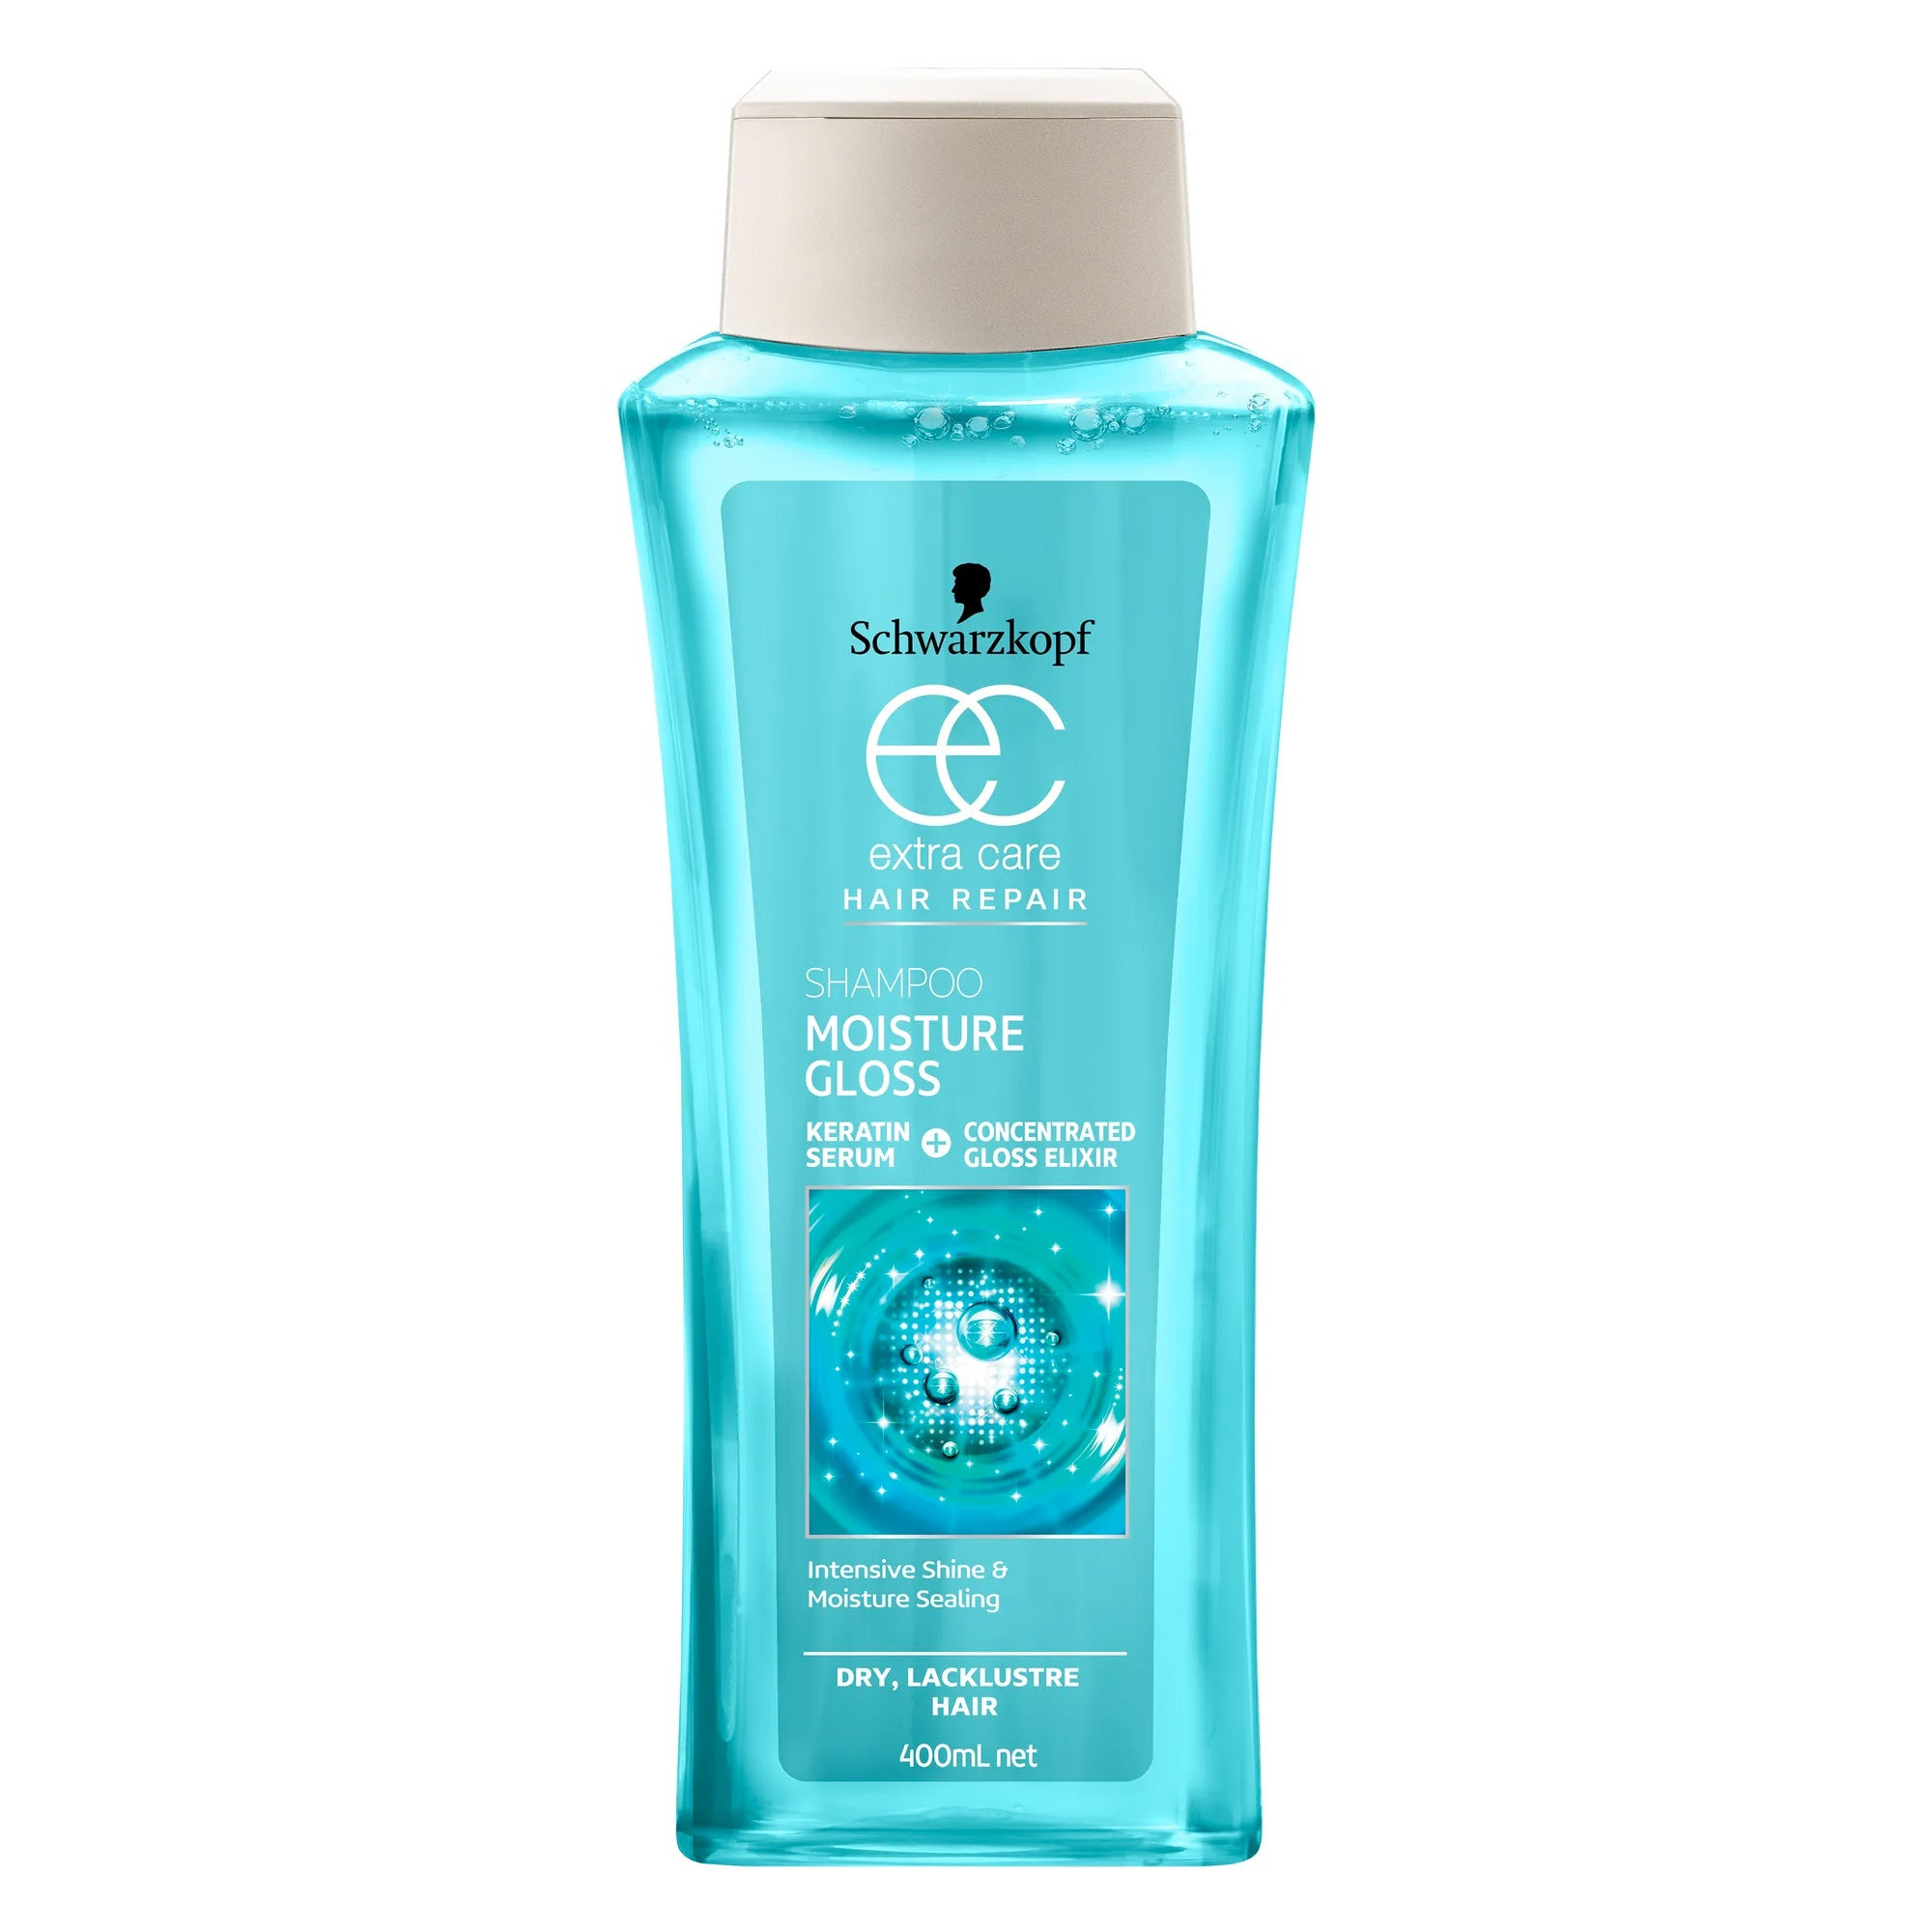 Schwarzkopf Extra Care Hair Repair Moisture Gloss Shampoo 400ml